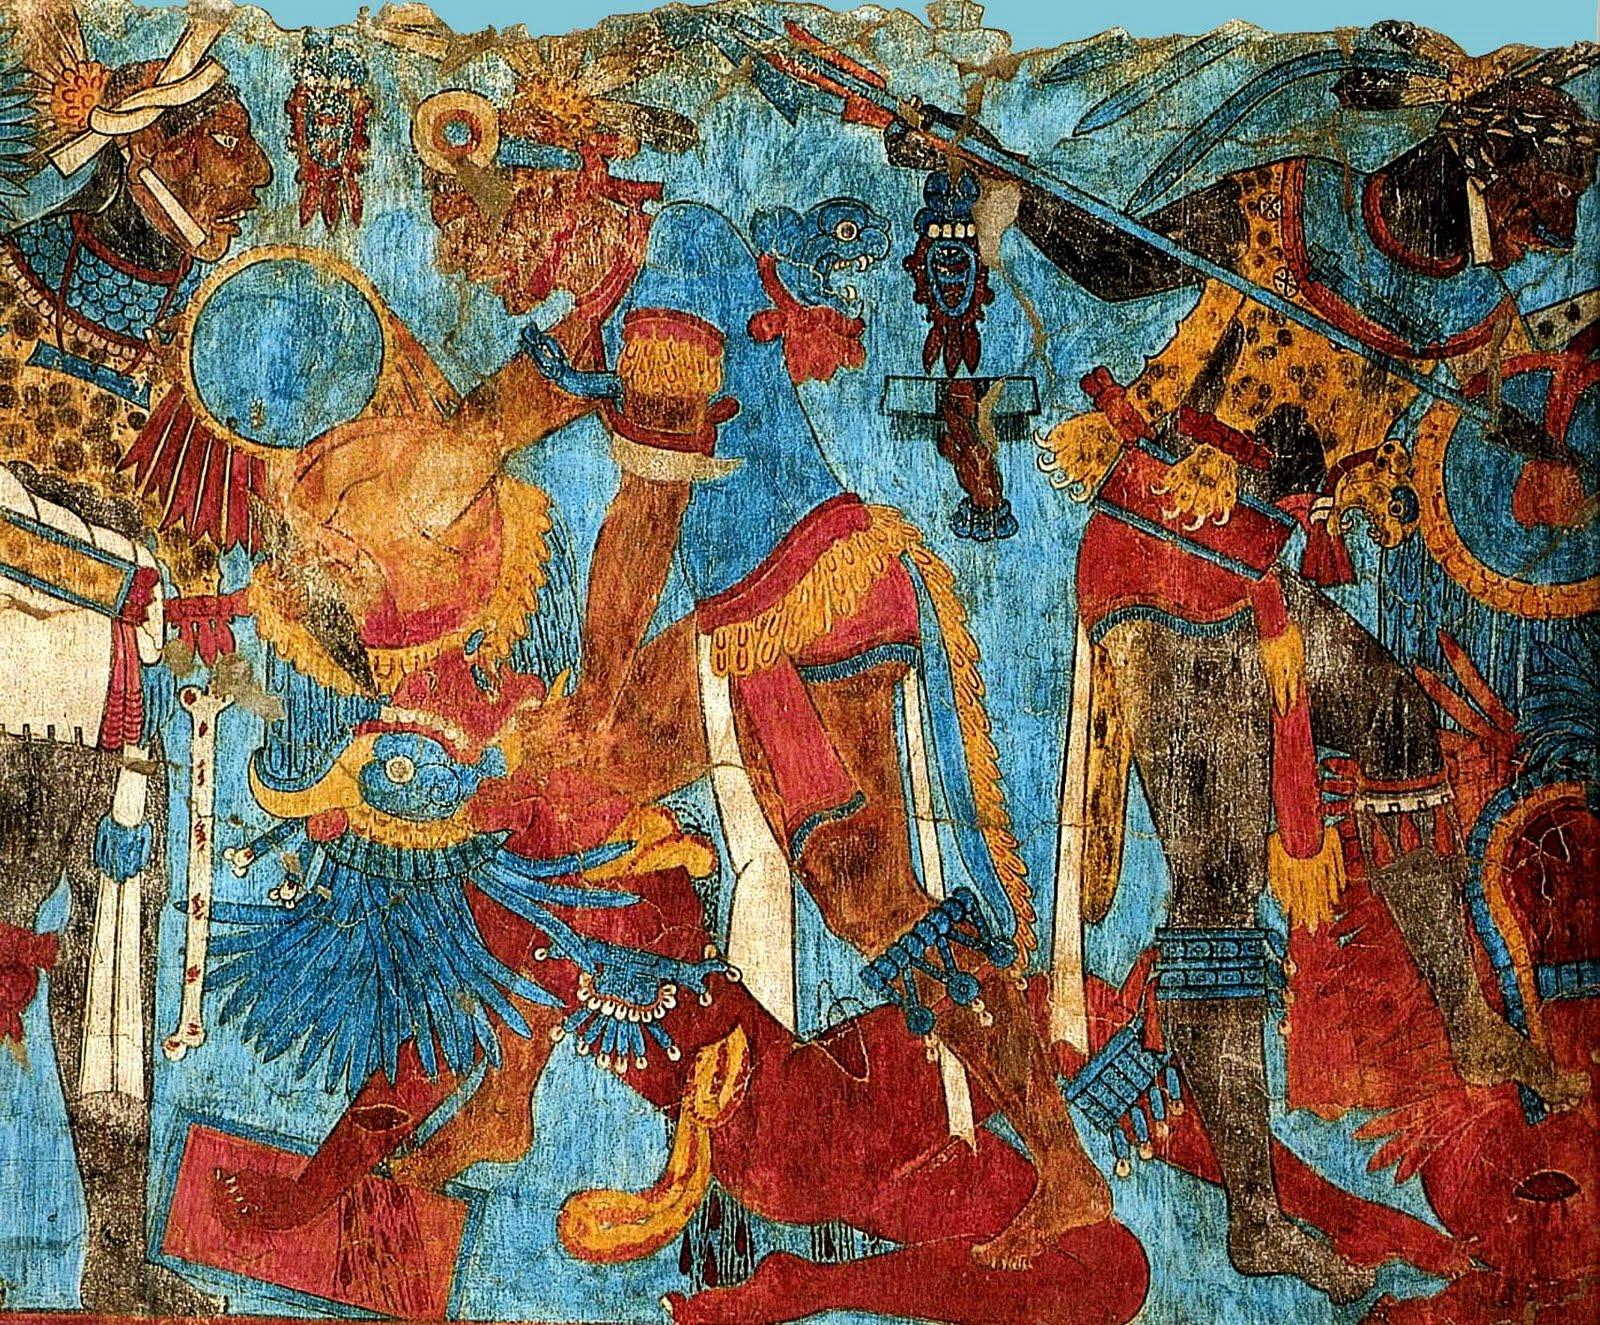 Docencia oscar robles sobre el muralismo mexicano for El mural de bonampak